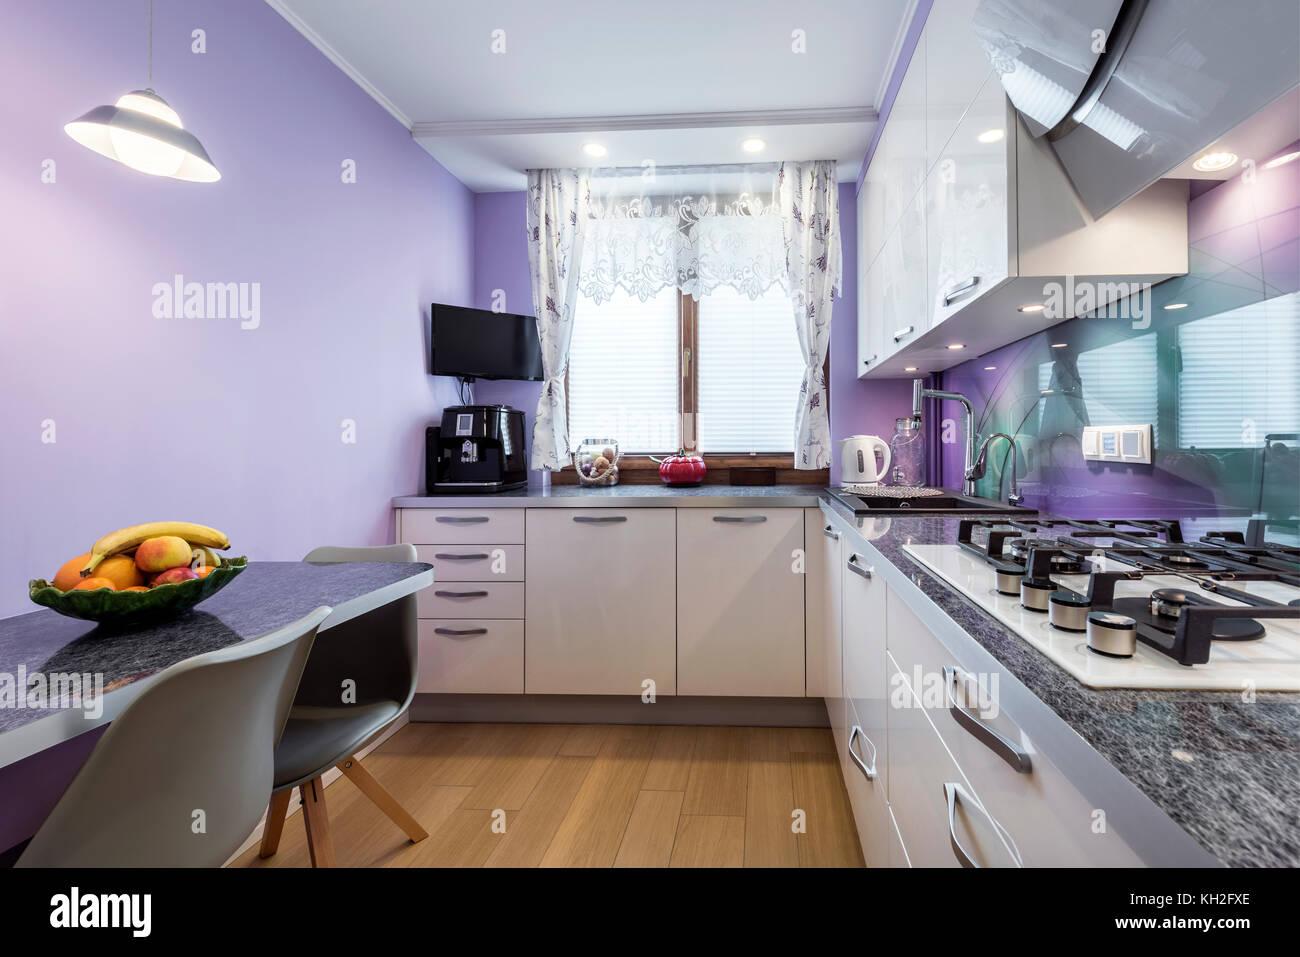 Modern Kitchen Interior Design In Lavender Violet Finishing Stock